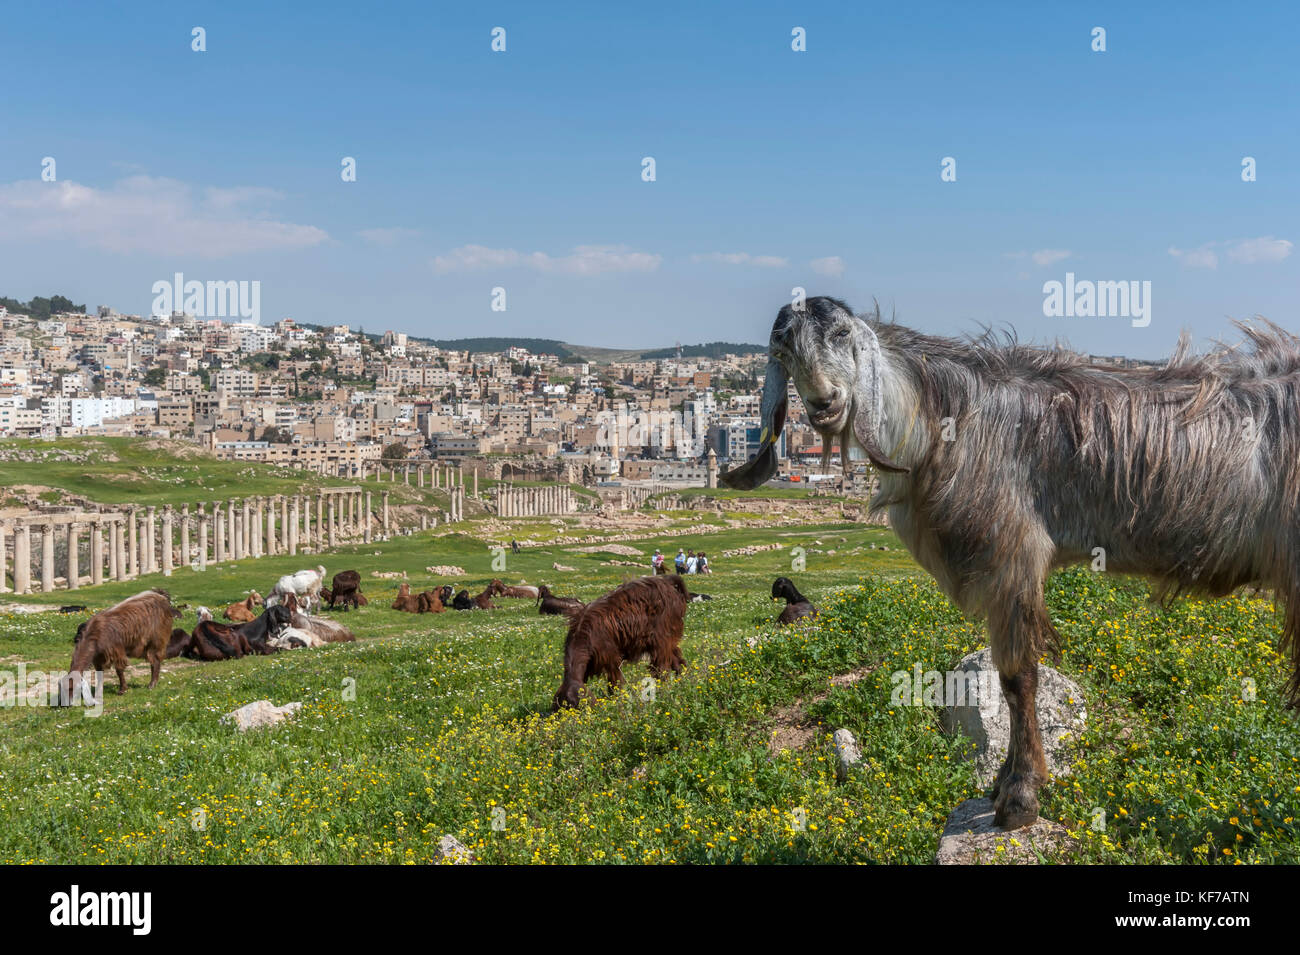 The ancient city of Jerash. Jordan Stock Photo